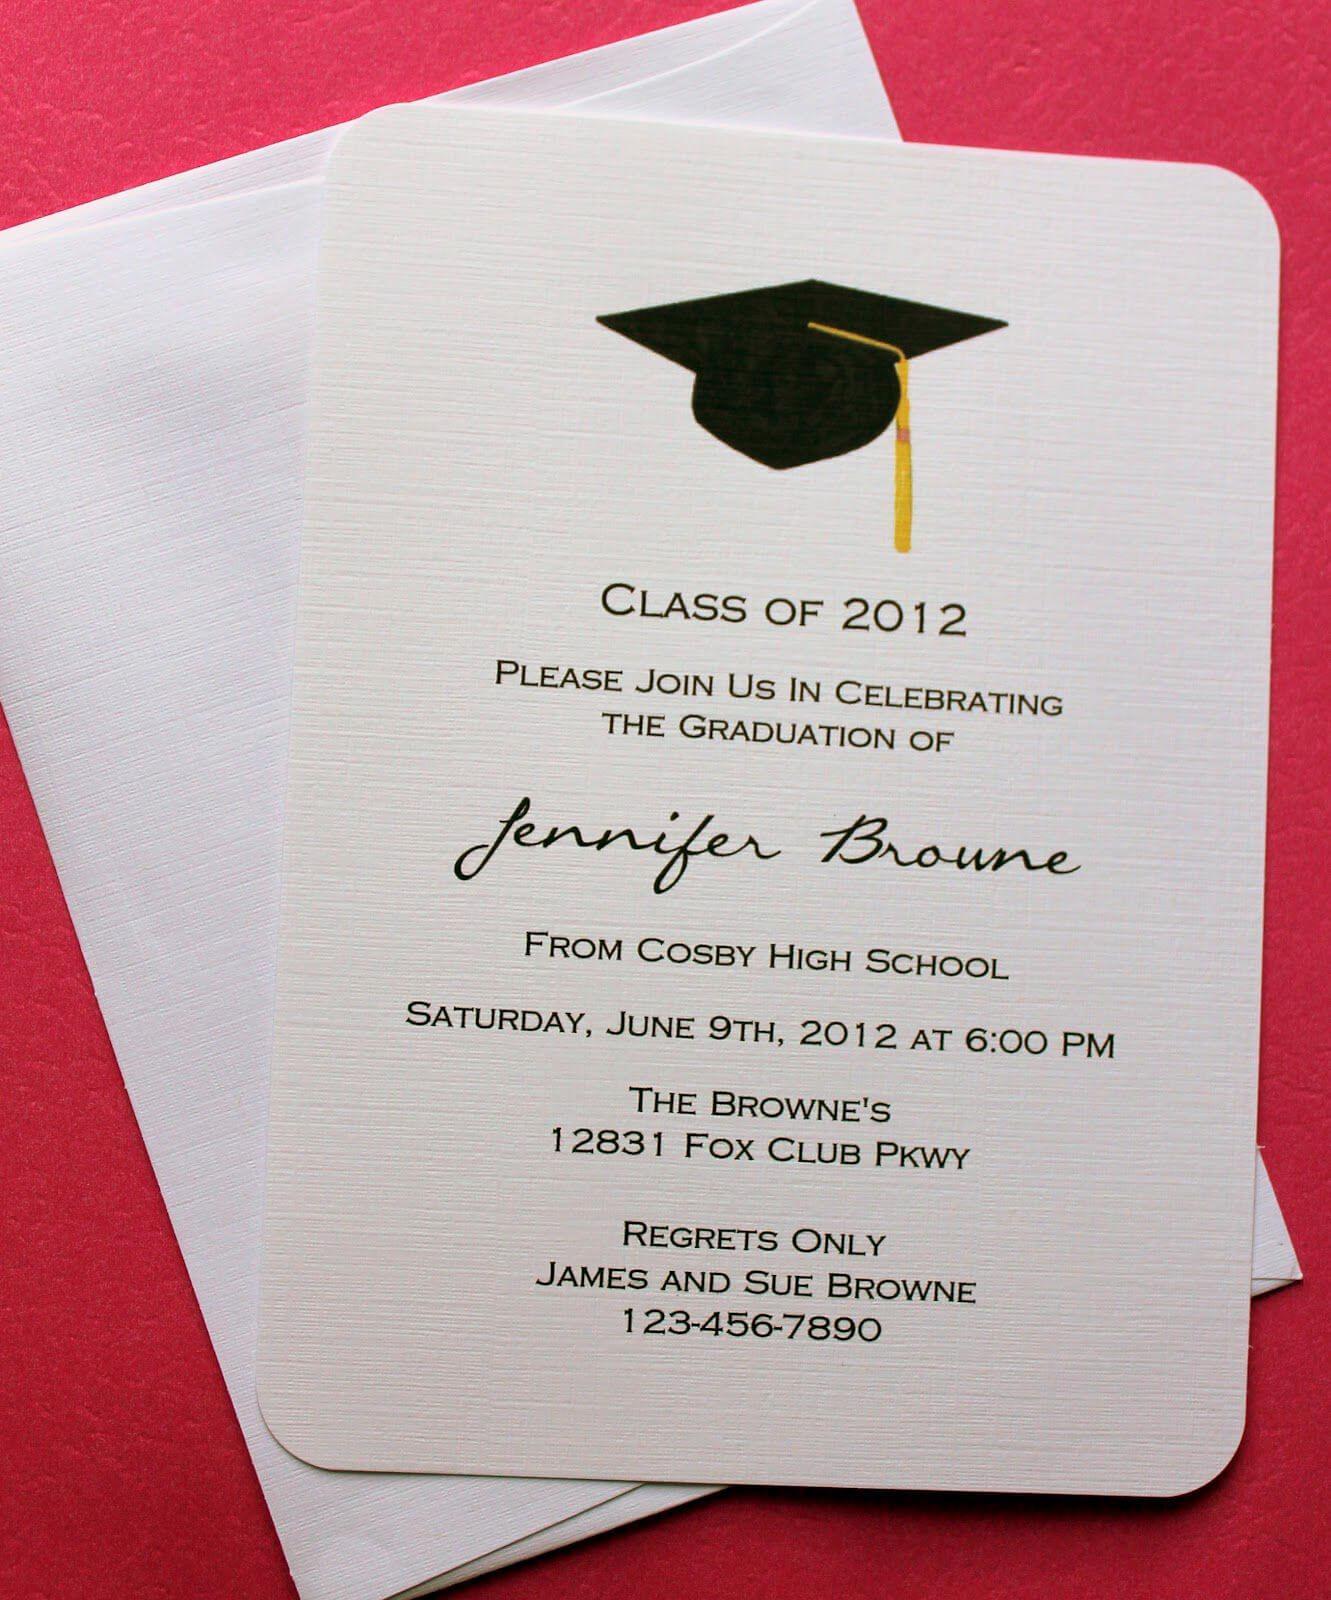 Graduation Invitation Templates Microsoft Word | Invitations Pertaining To Graduation Party Invitation Templates Free Word